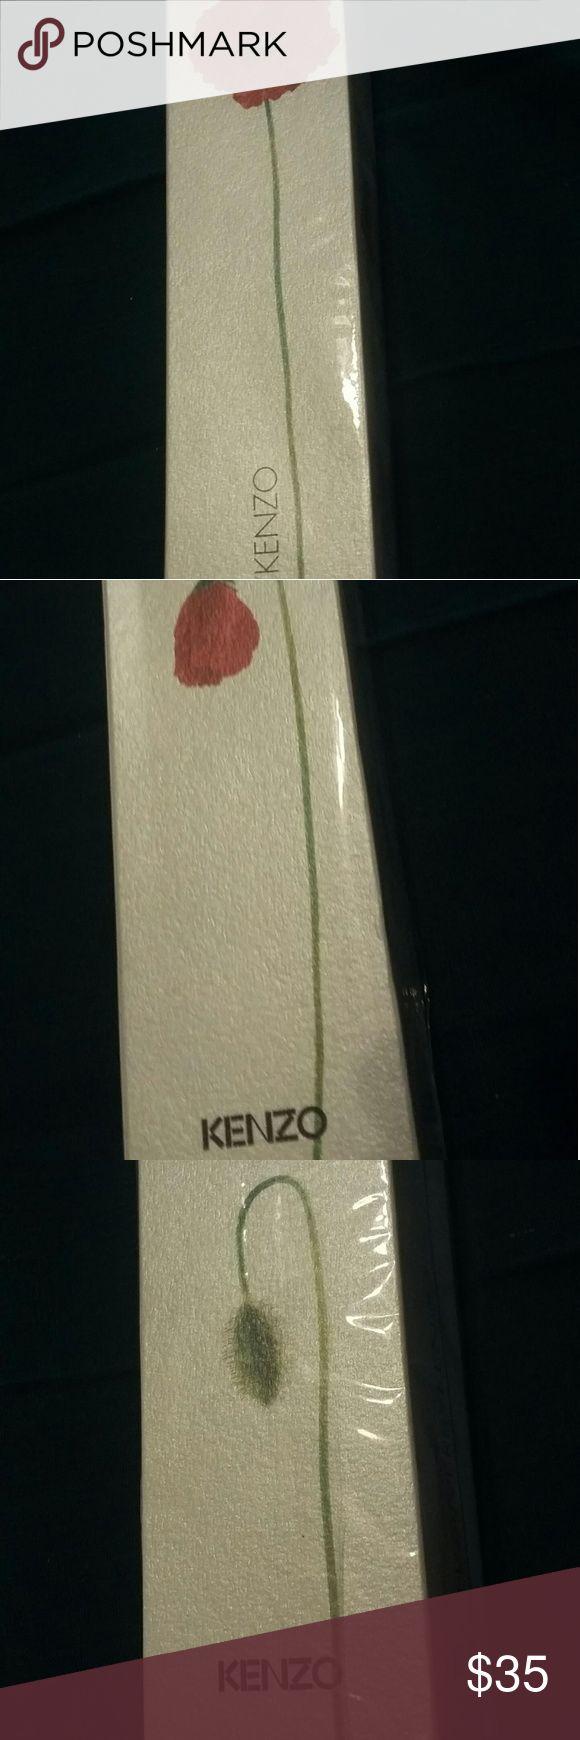 Flower by Kenzo Perfume Kenzo Eau De Parfum Other